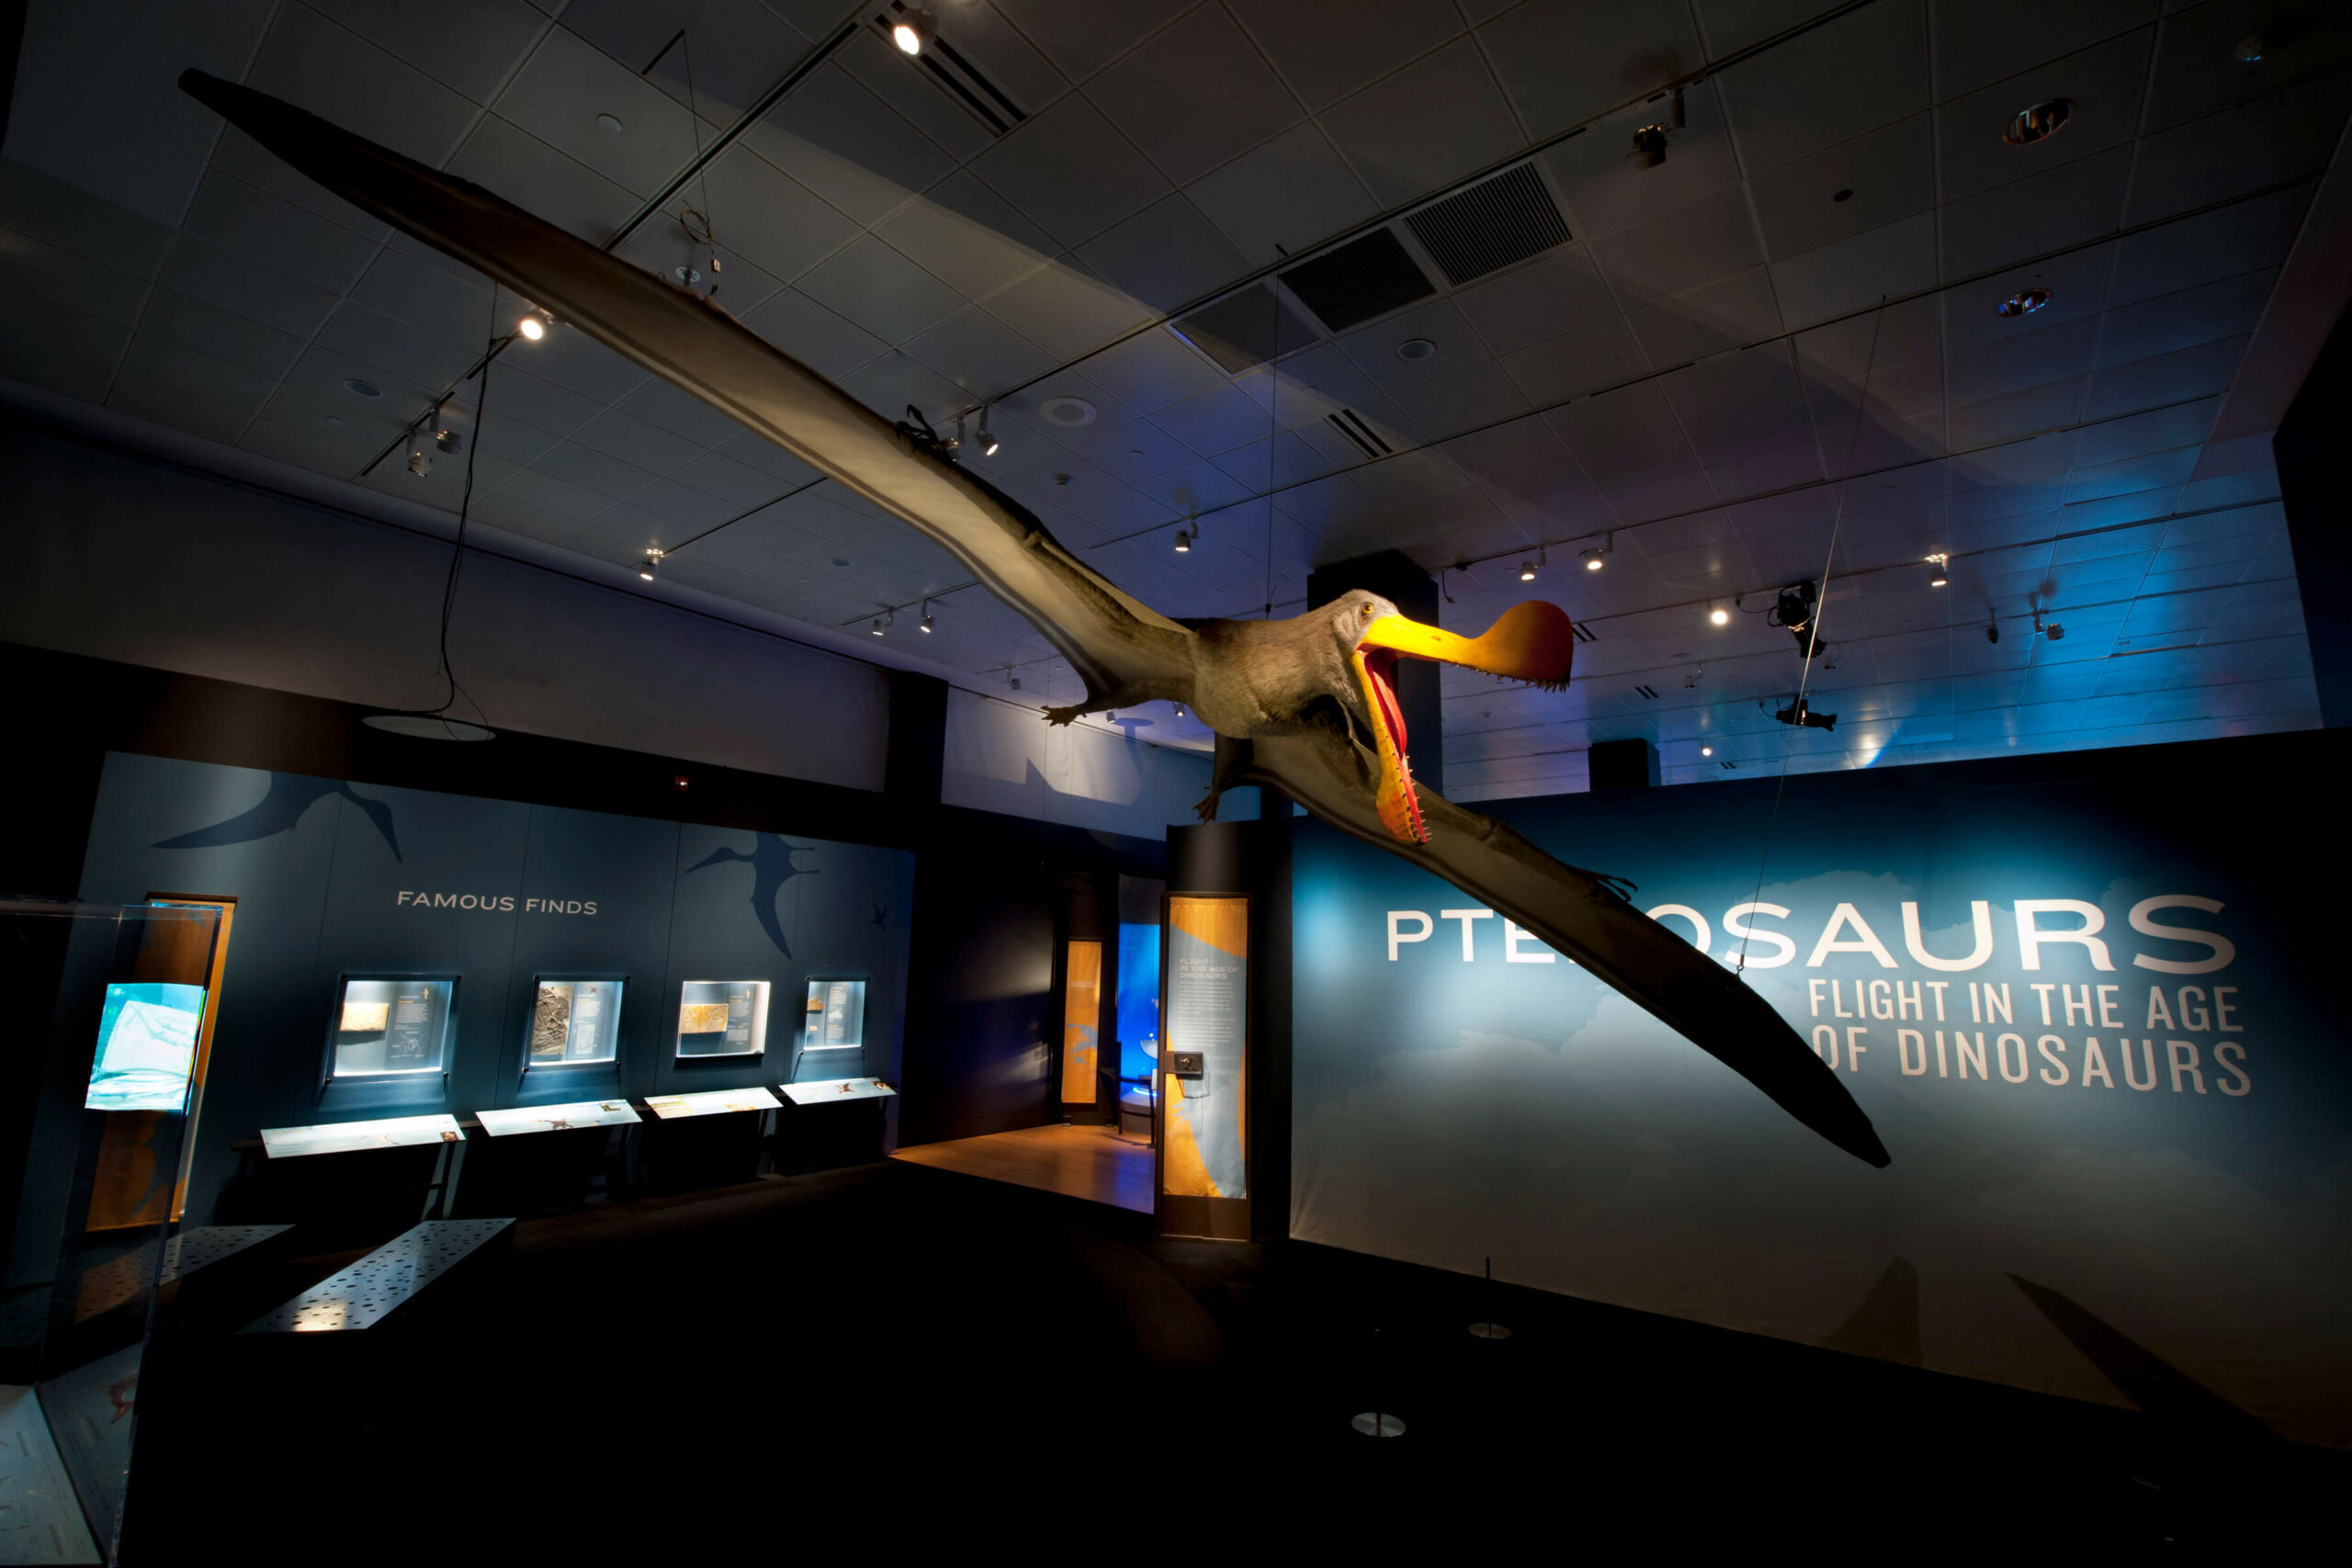 frost science Pterosaurs entrance